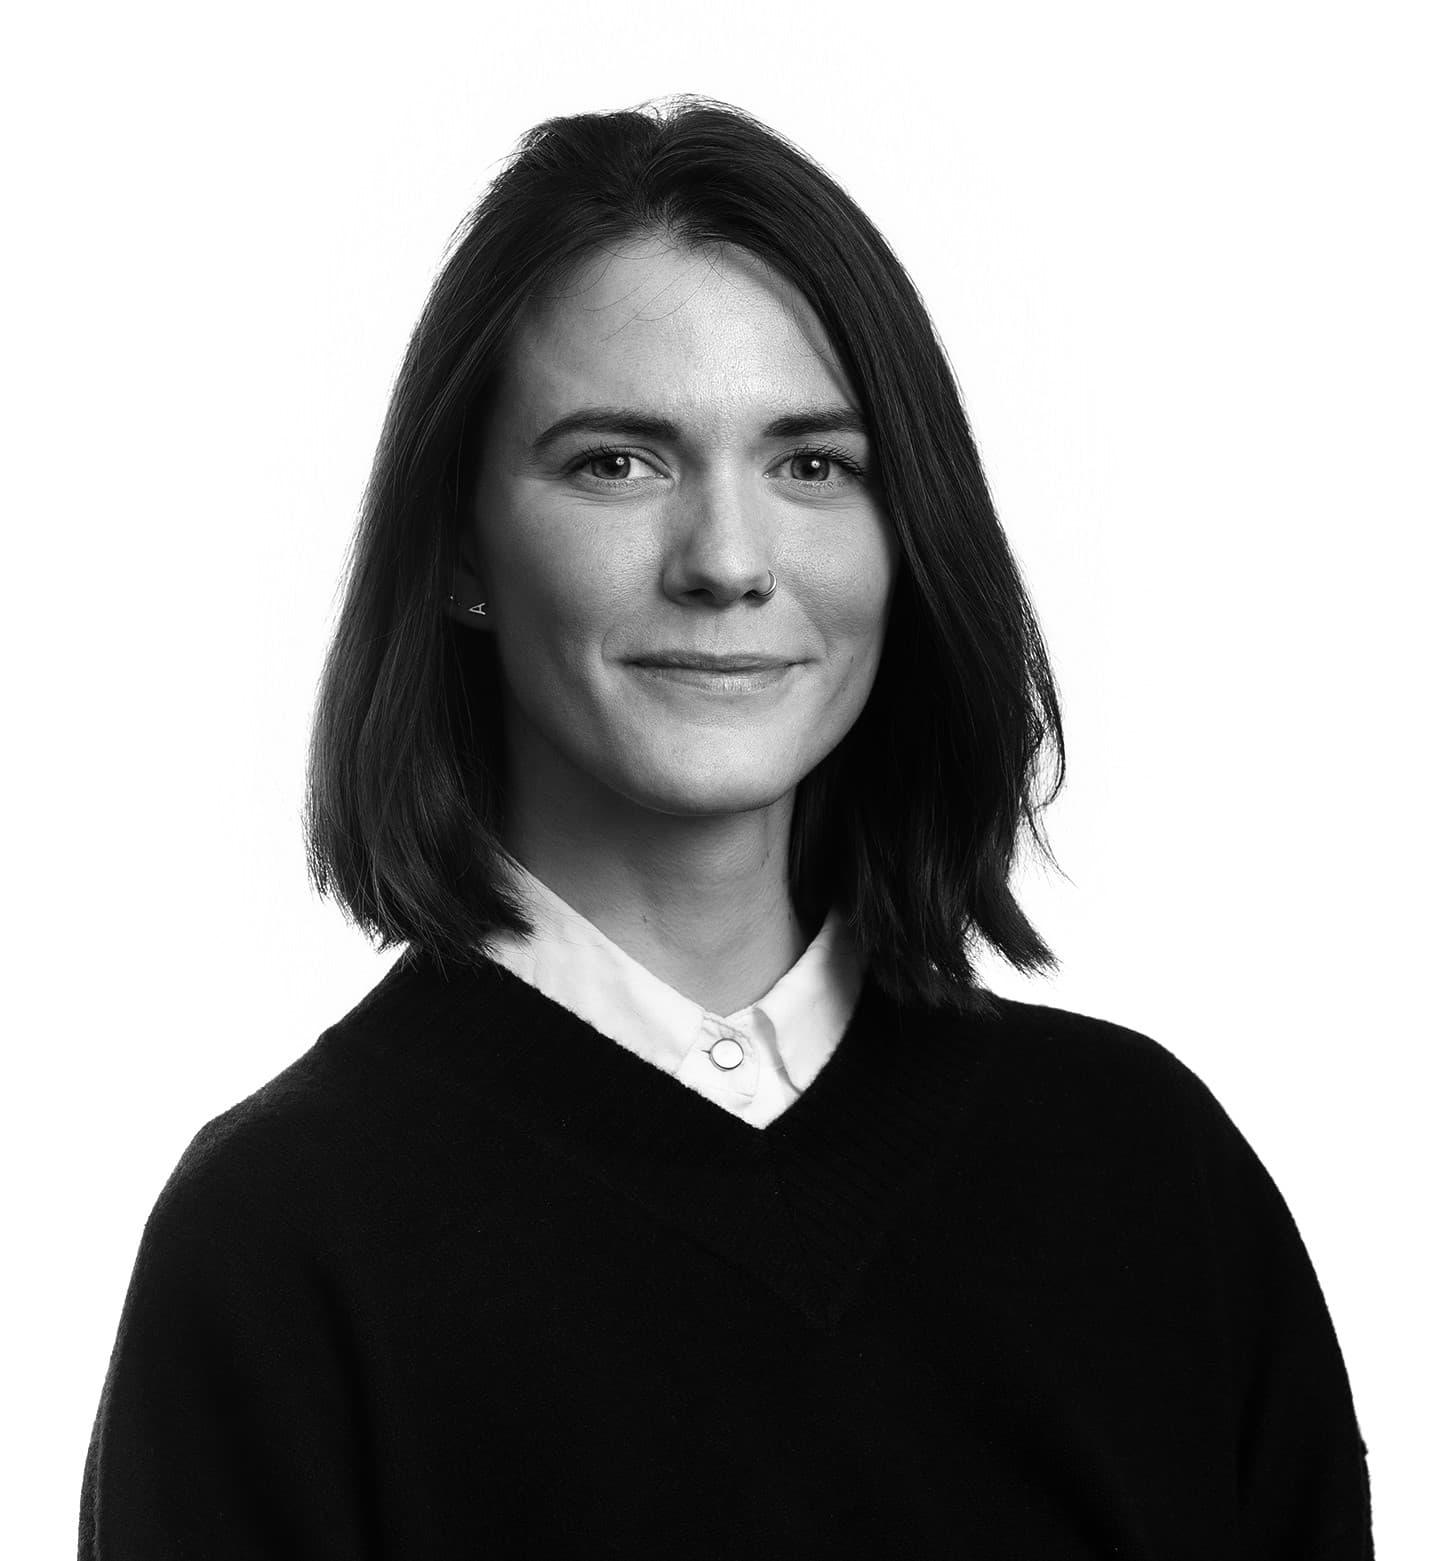 Amalie Marie Laustsen